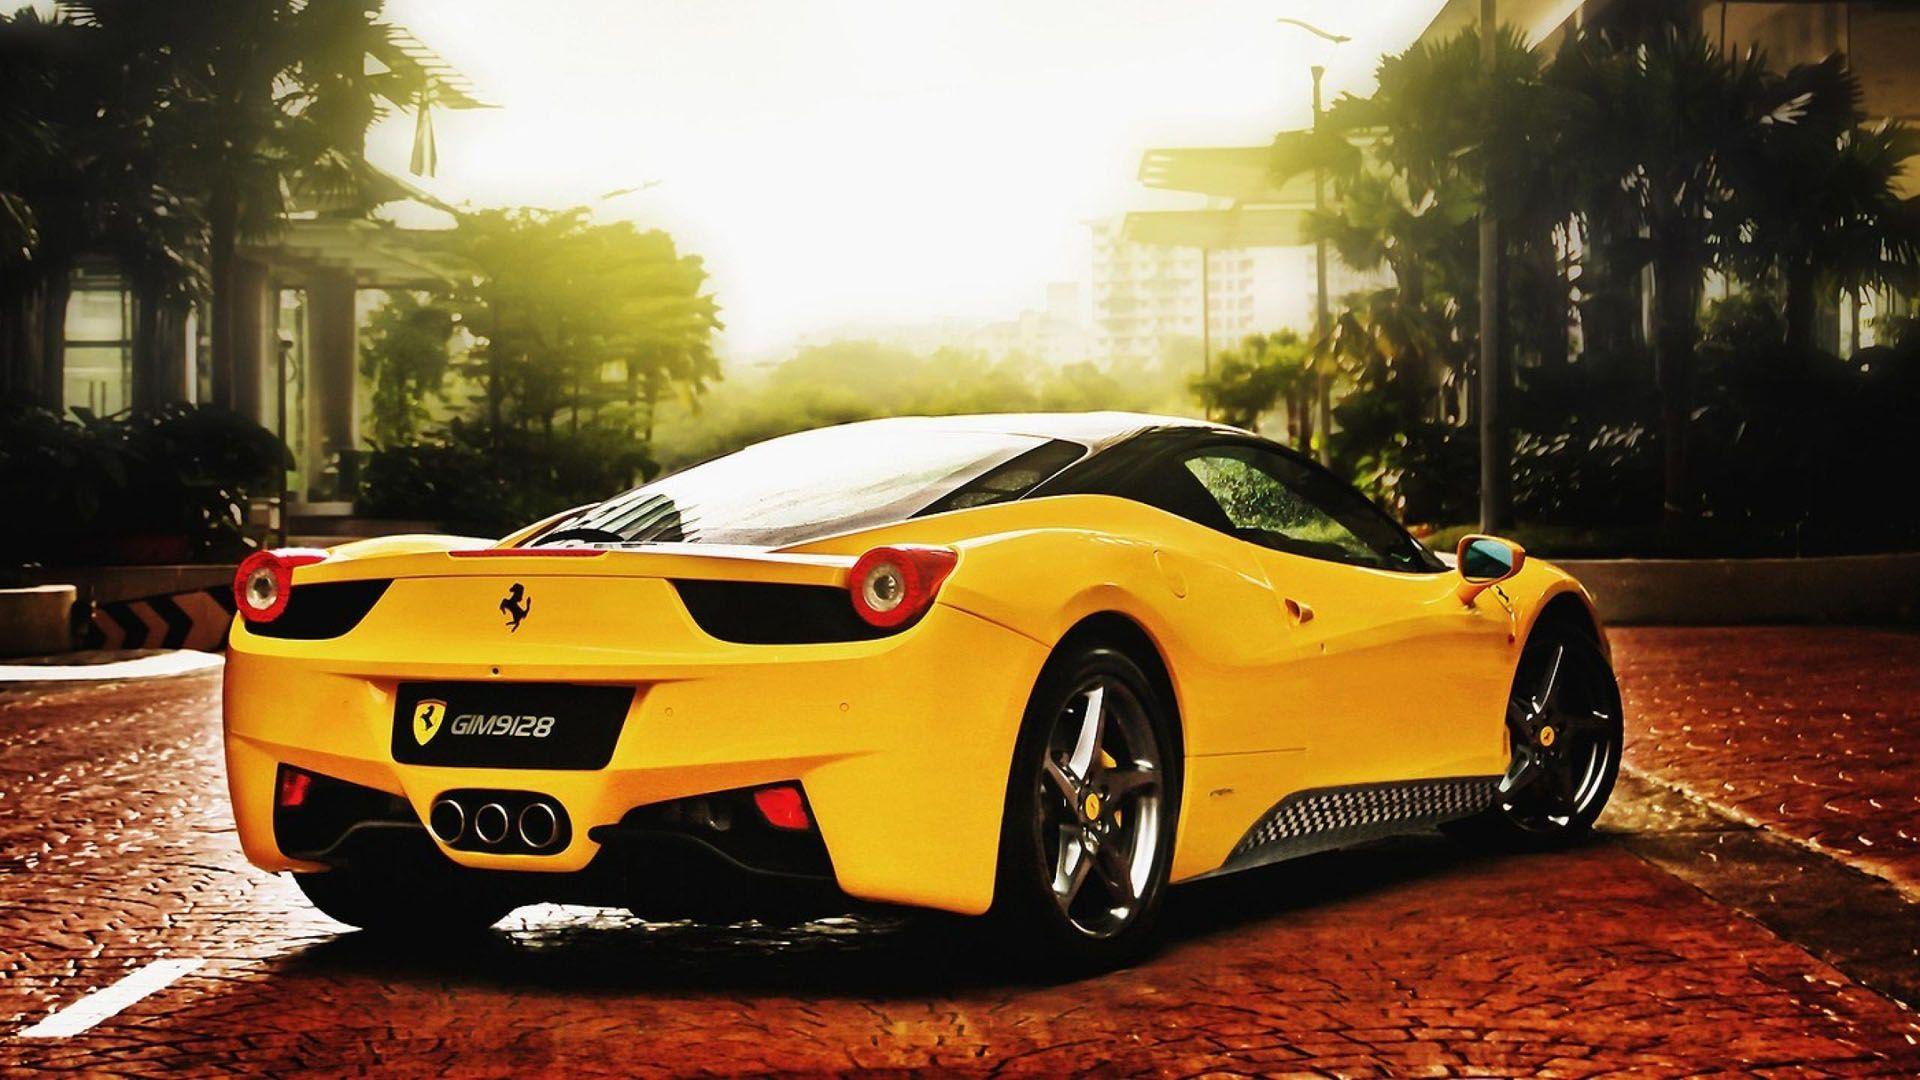 Cool Yellow Ferrari Wallpaper